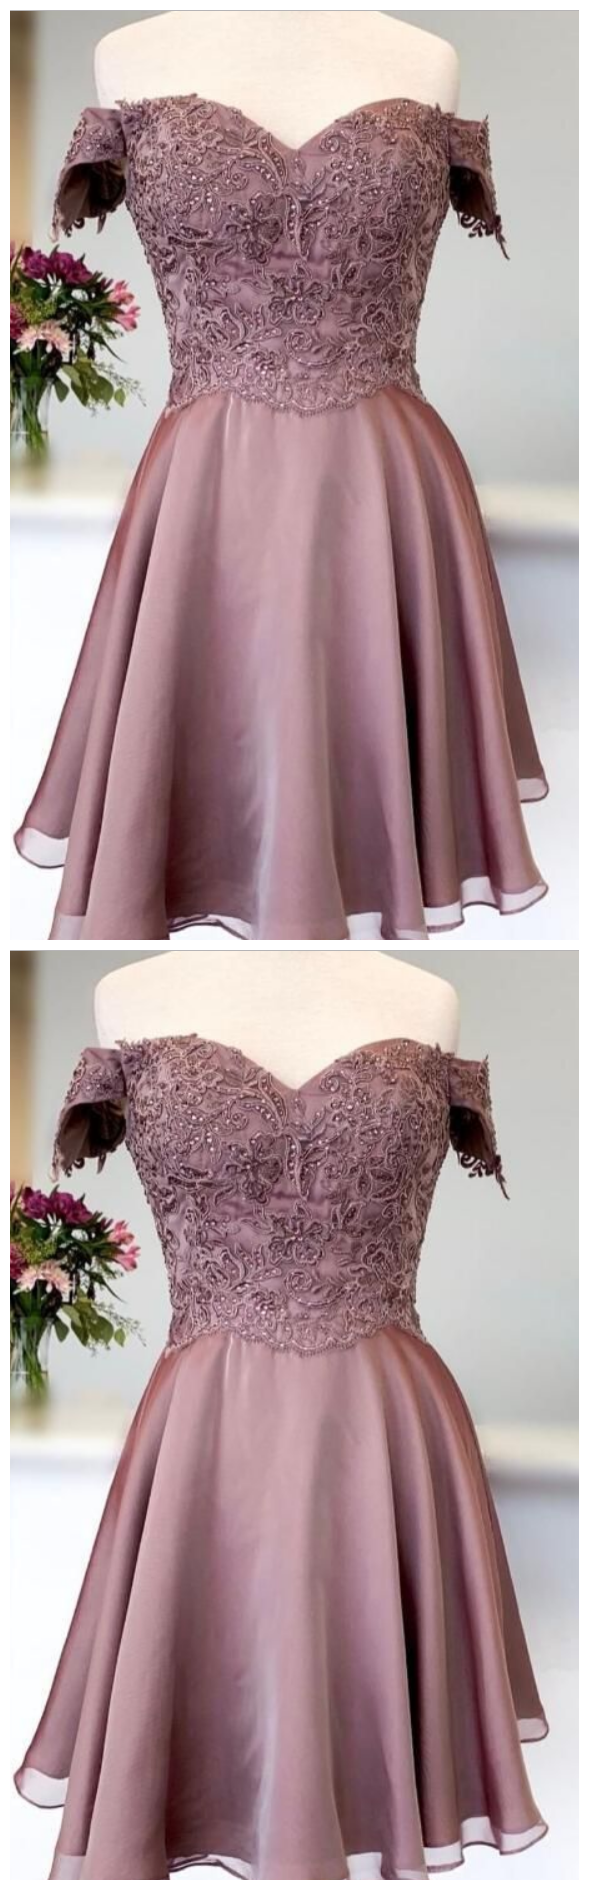 princess short prom dress off the shoulder, brown homecoming dress short